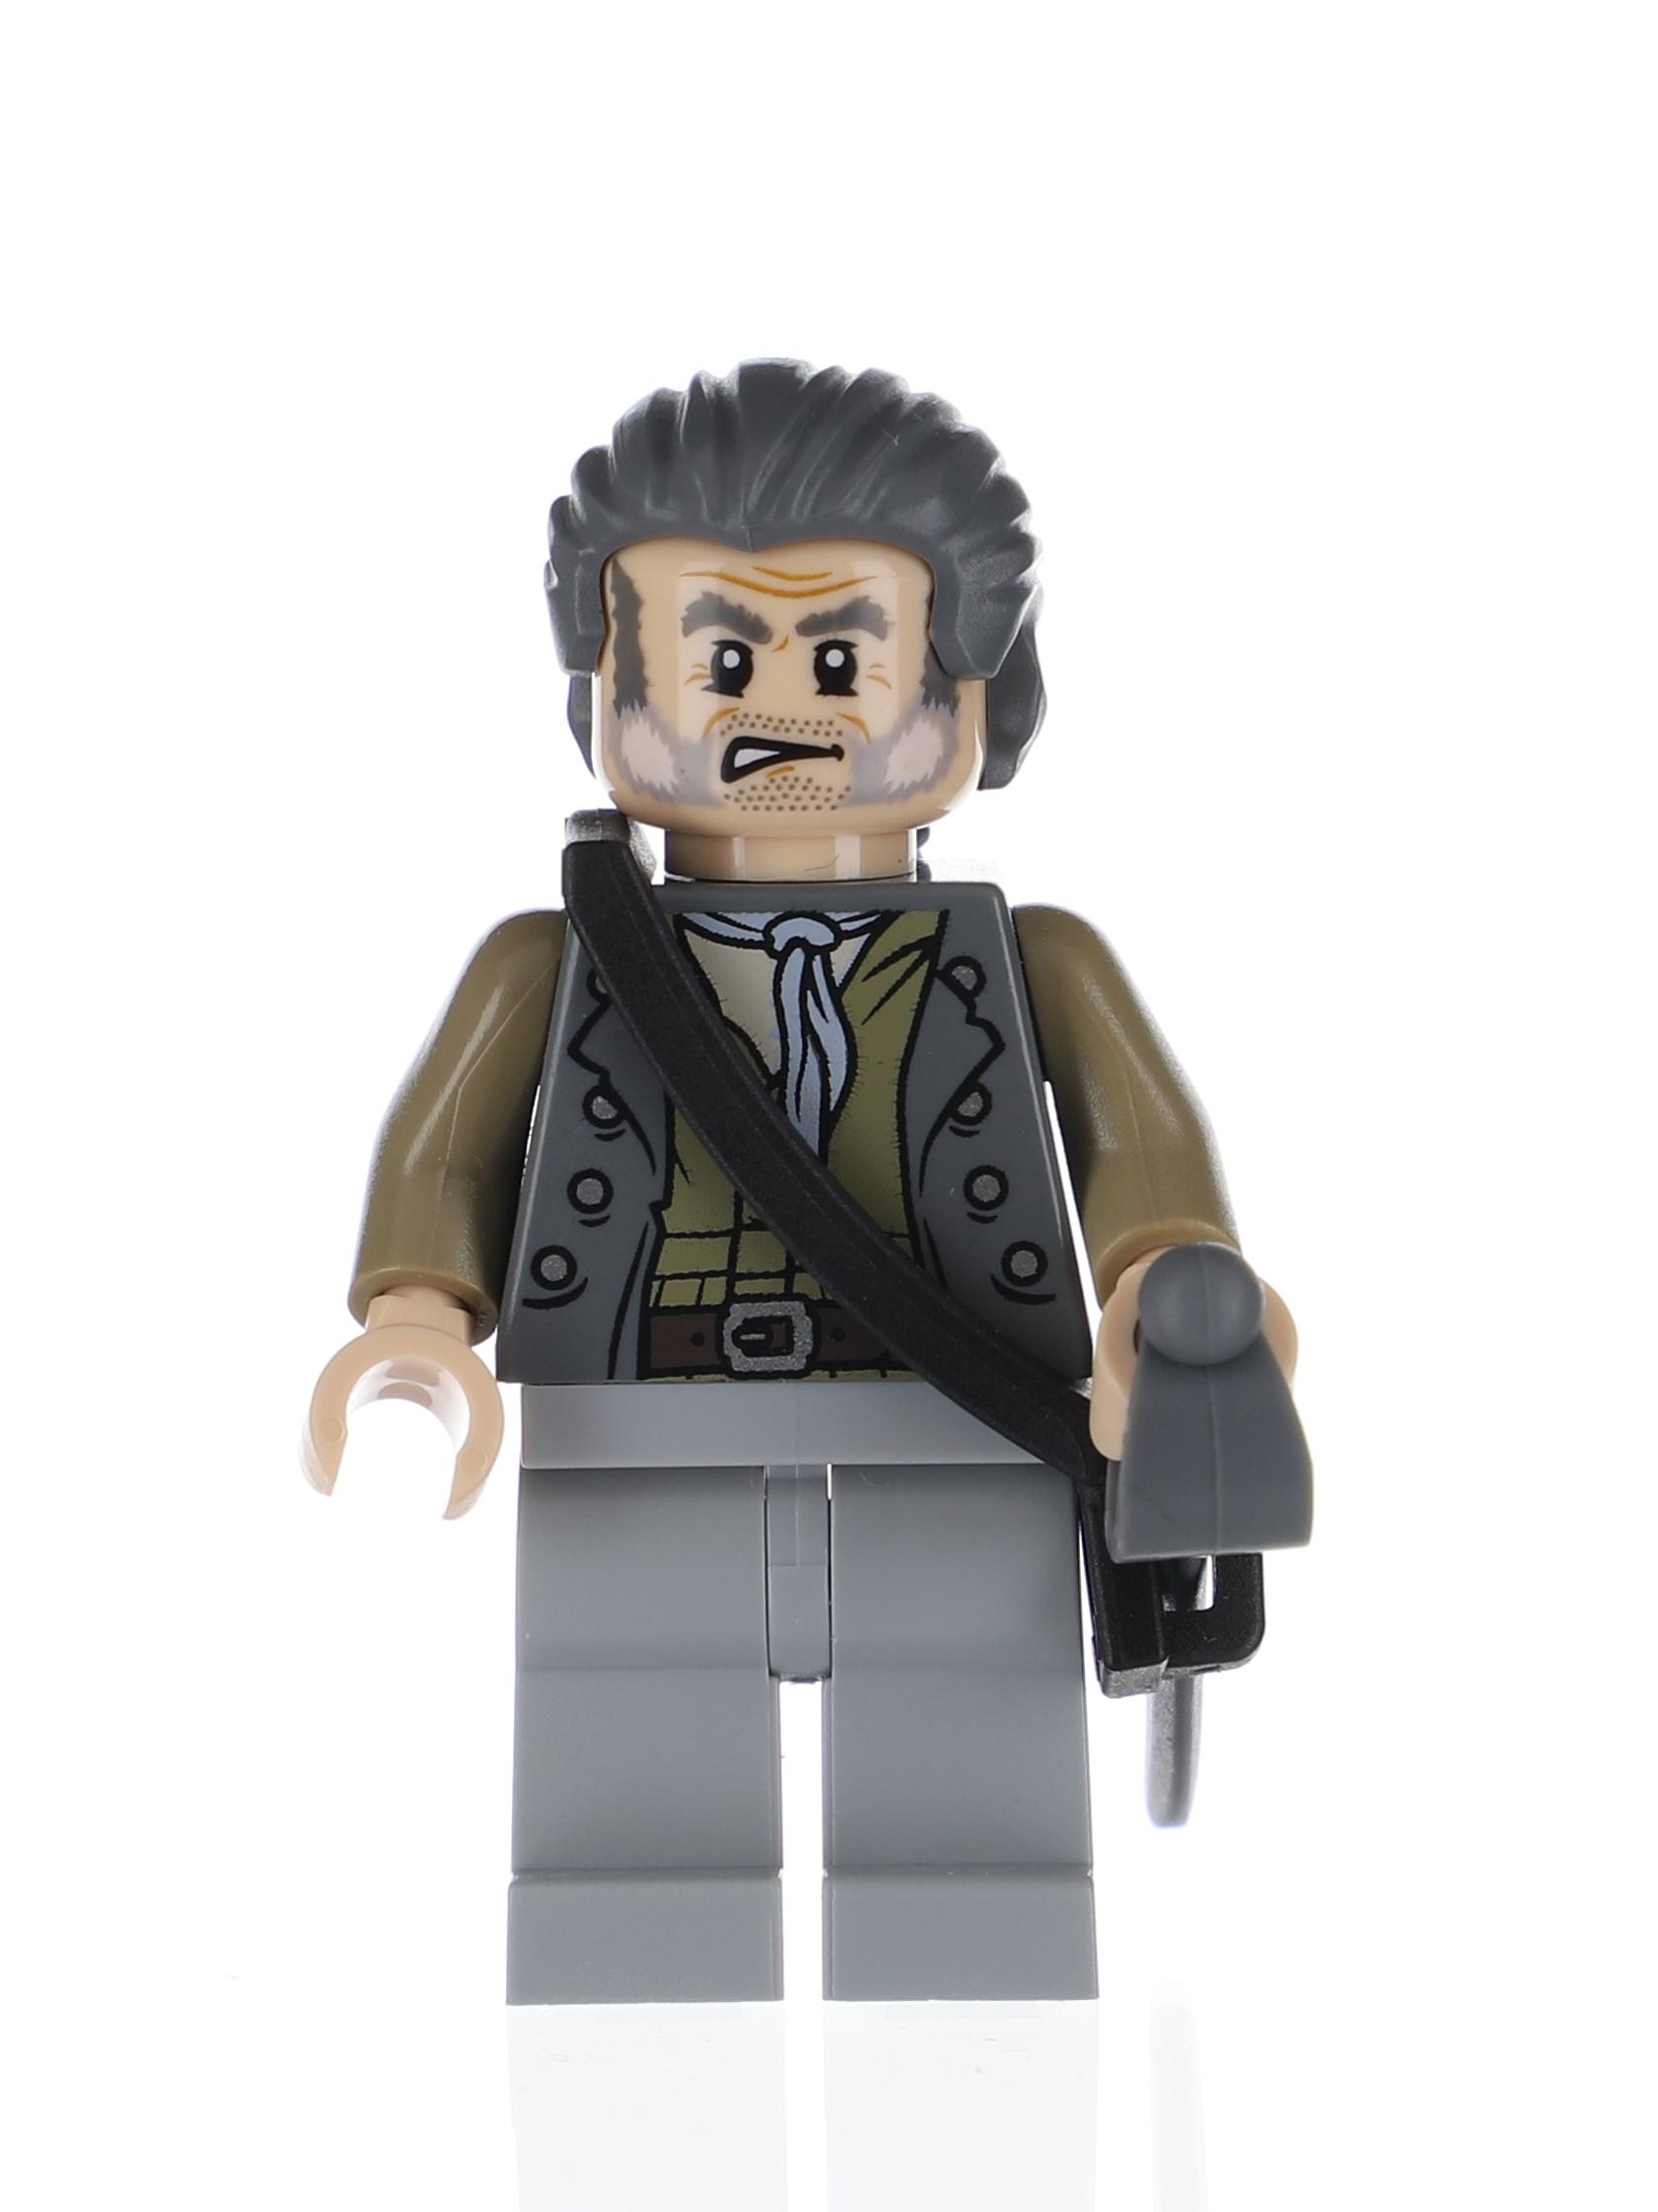 Joshamee Gibbs Pirates of the Caribbean Minifig // Mini Figure LEGO 4184